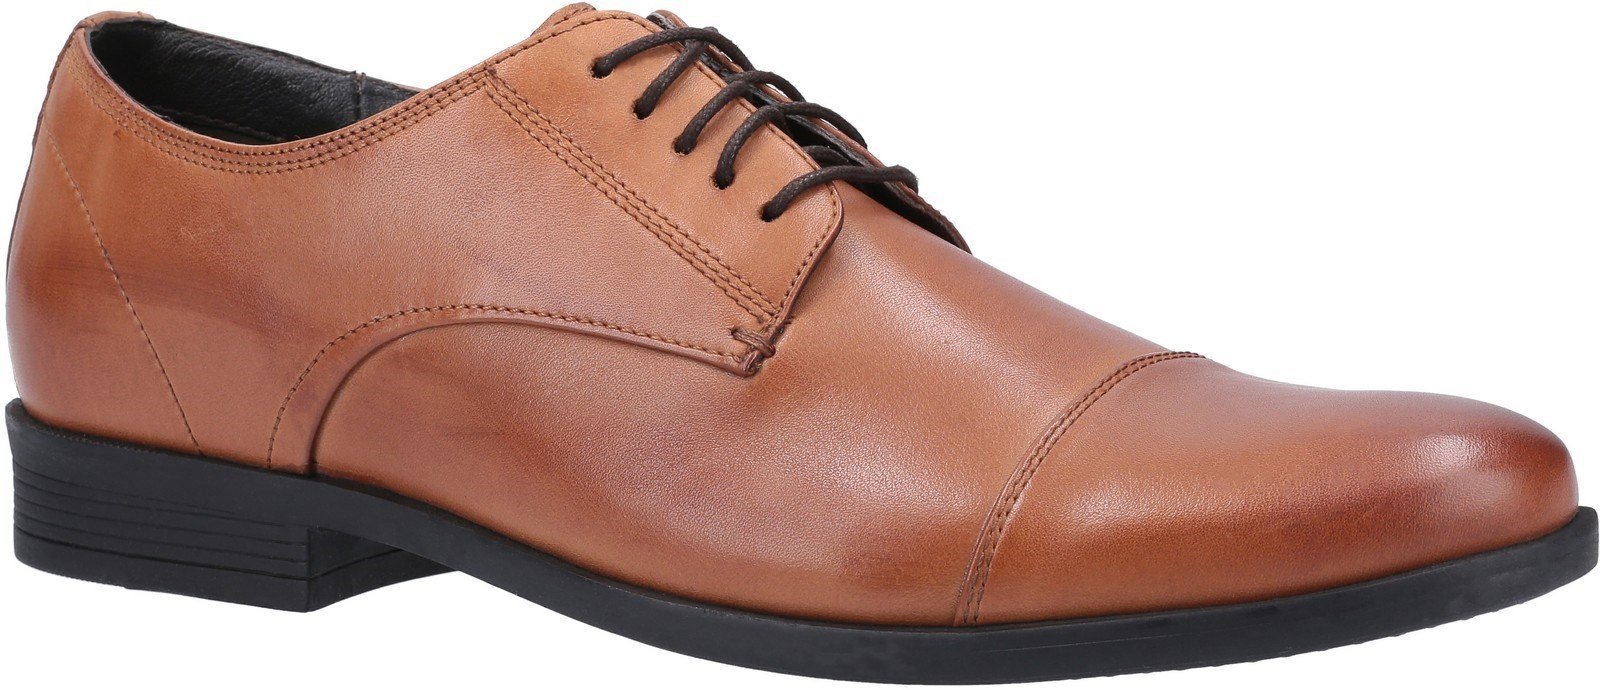 Hush Puppies Men's Ollie Cap Toe Lace Up Shoe Various Colours 29187 - Dark Brown 6